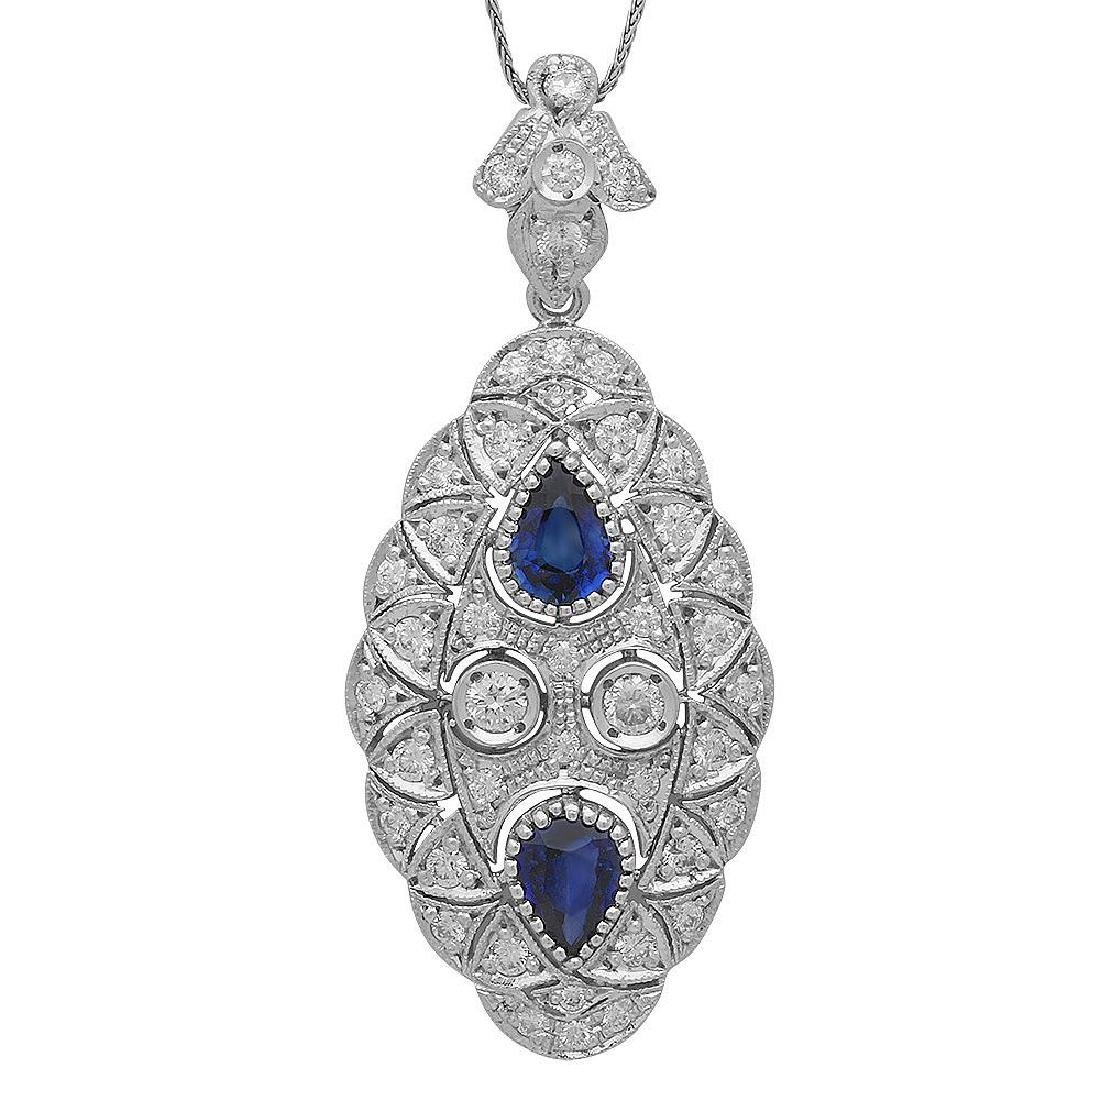 14K Gold 2.47ct Sapphire 1.96ct Diamond Pendant